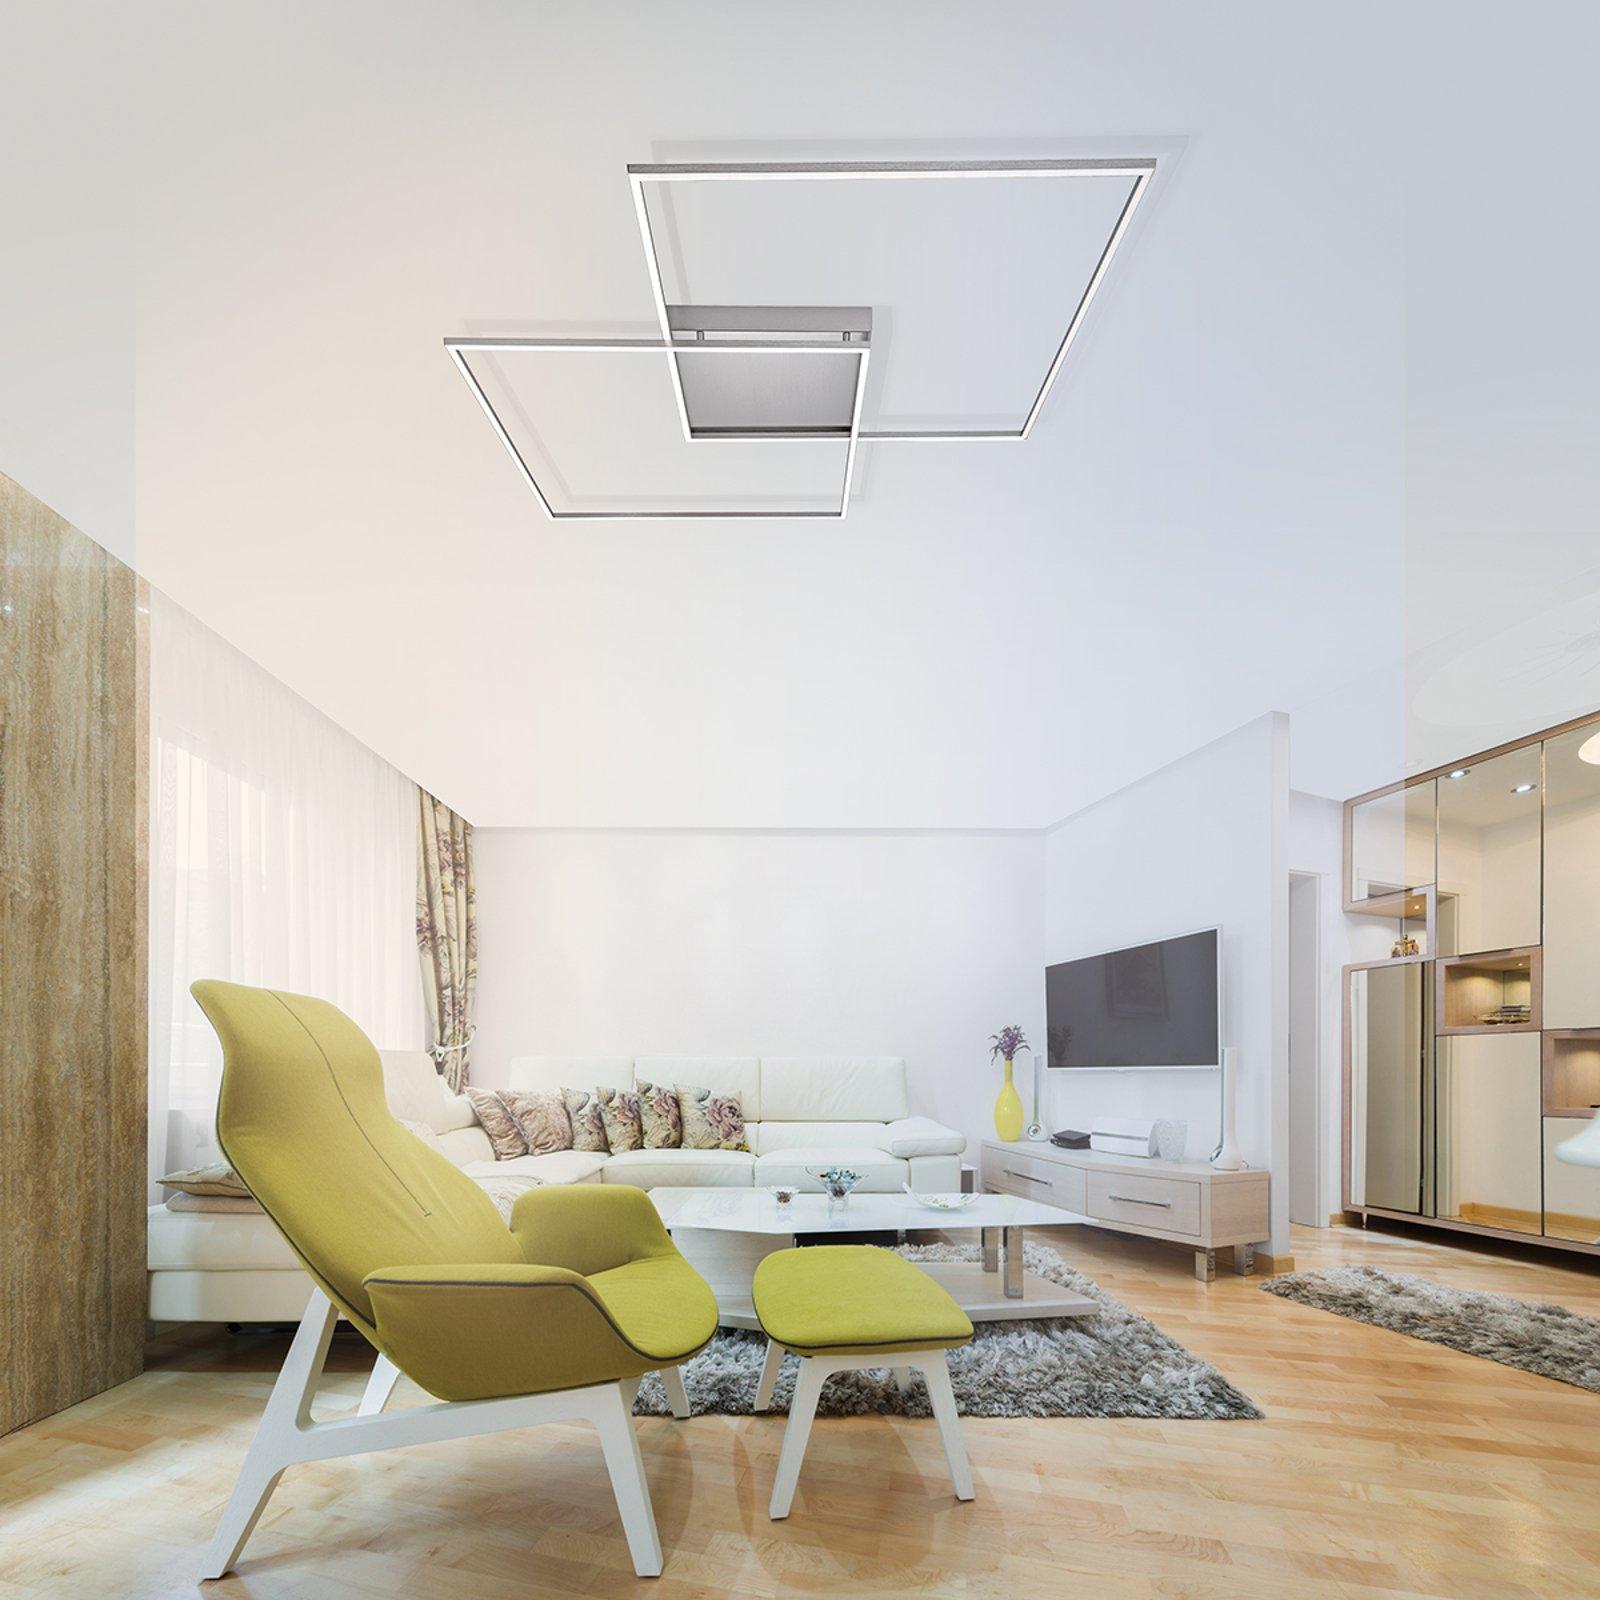 Inigo - LED-taklampe med fjernkontr. 68 cm